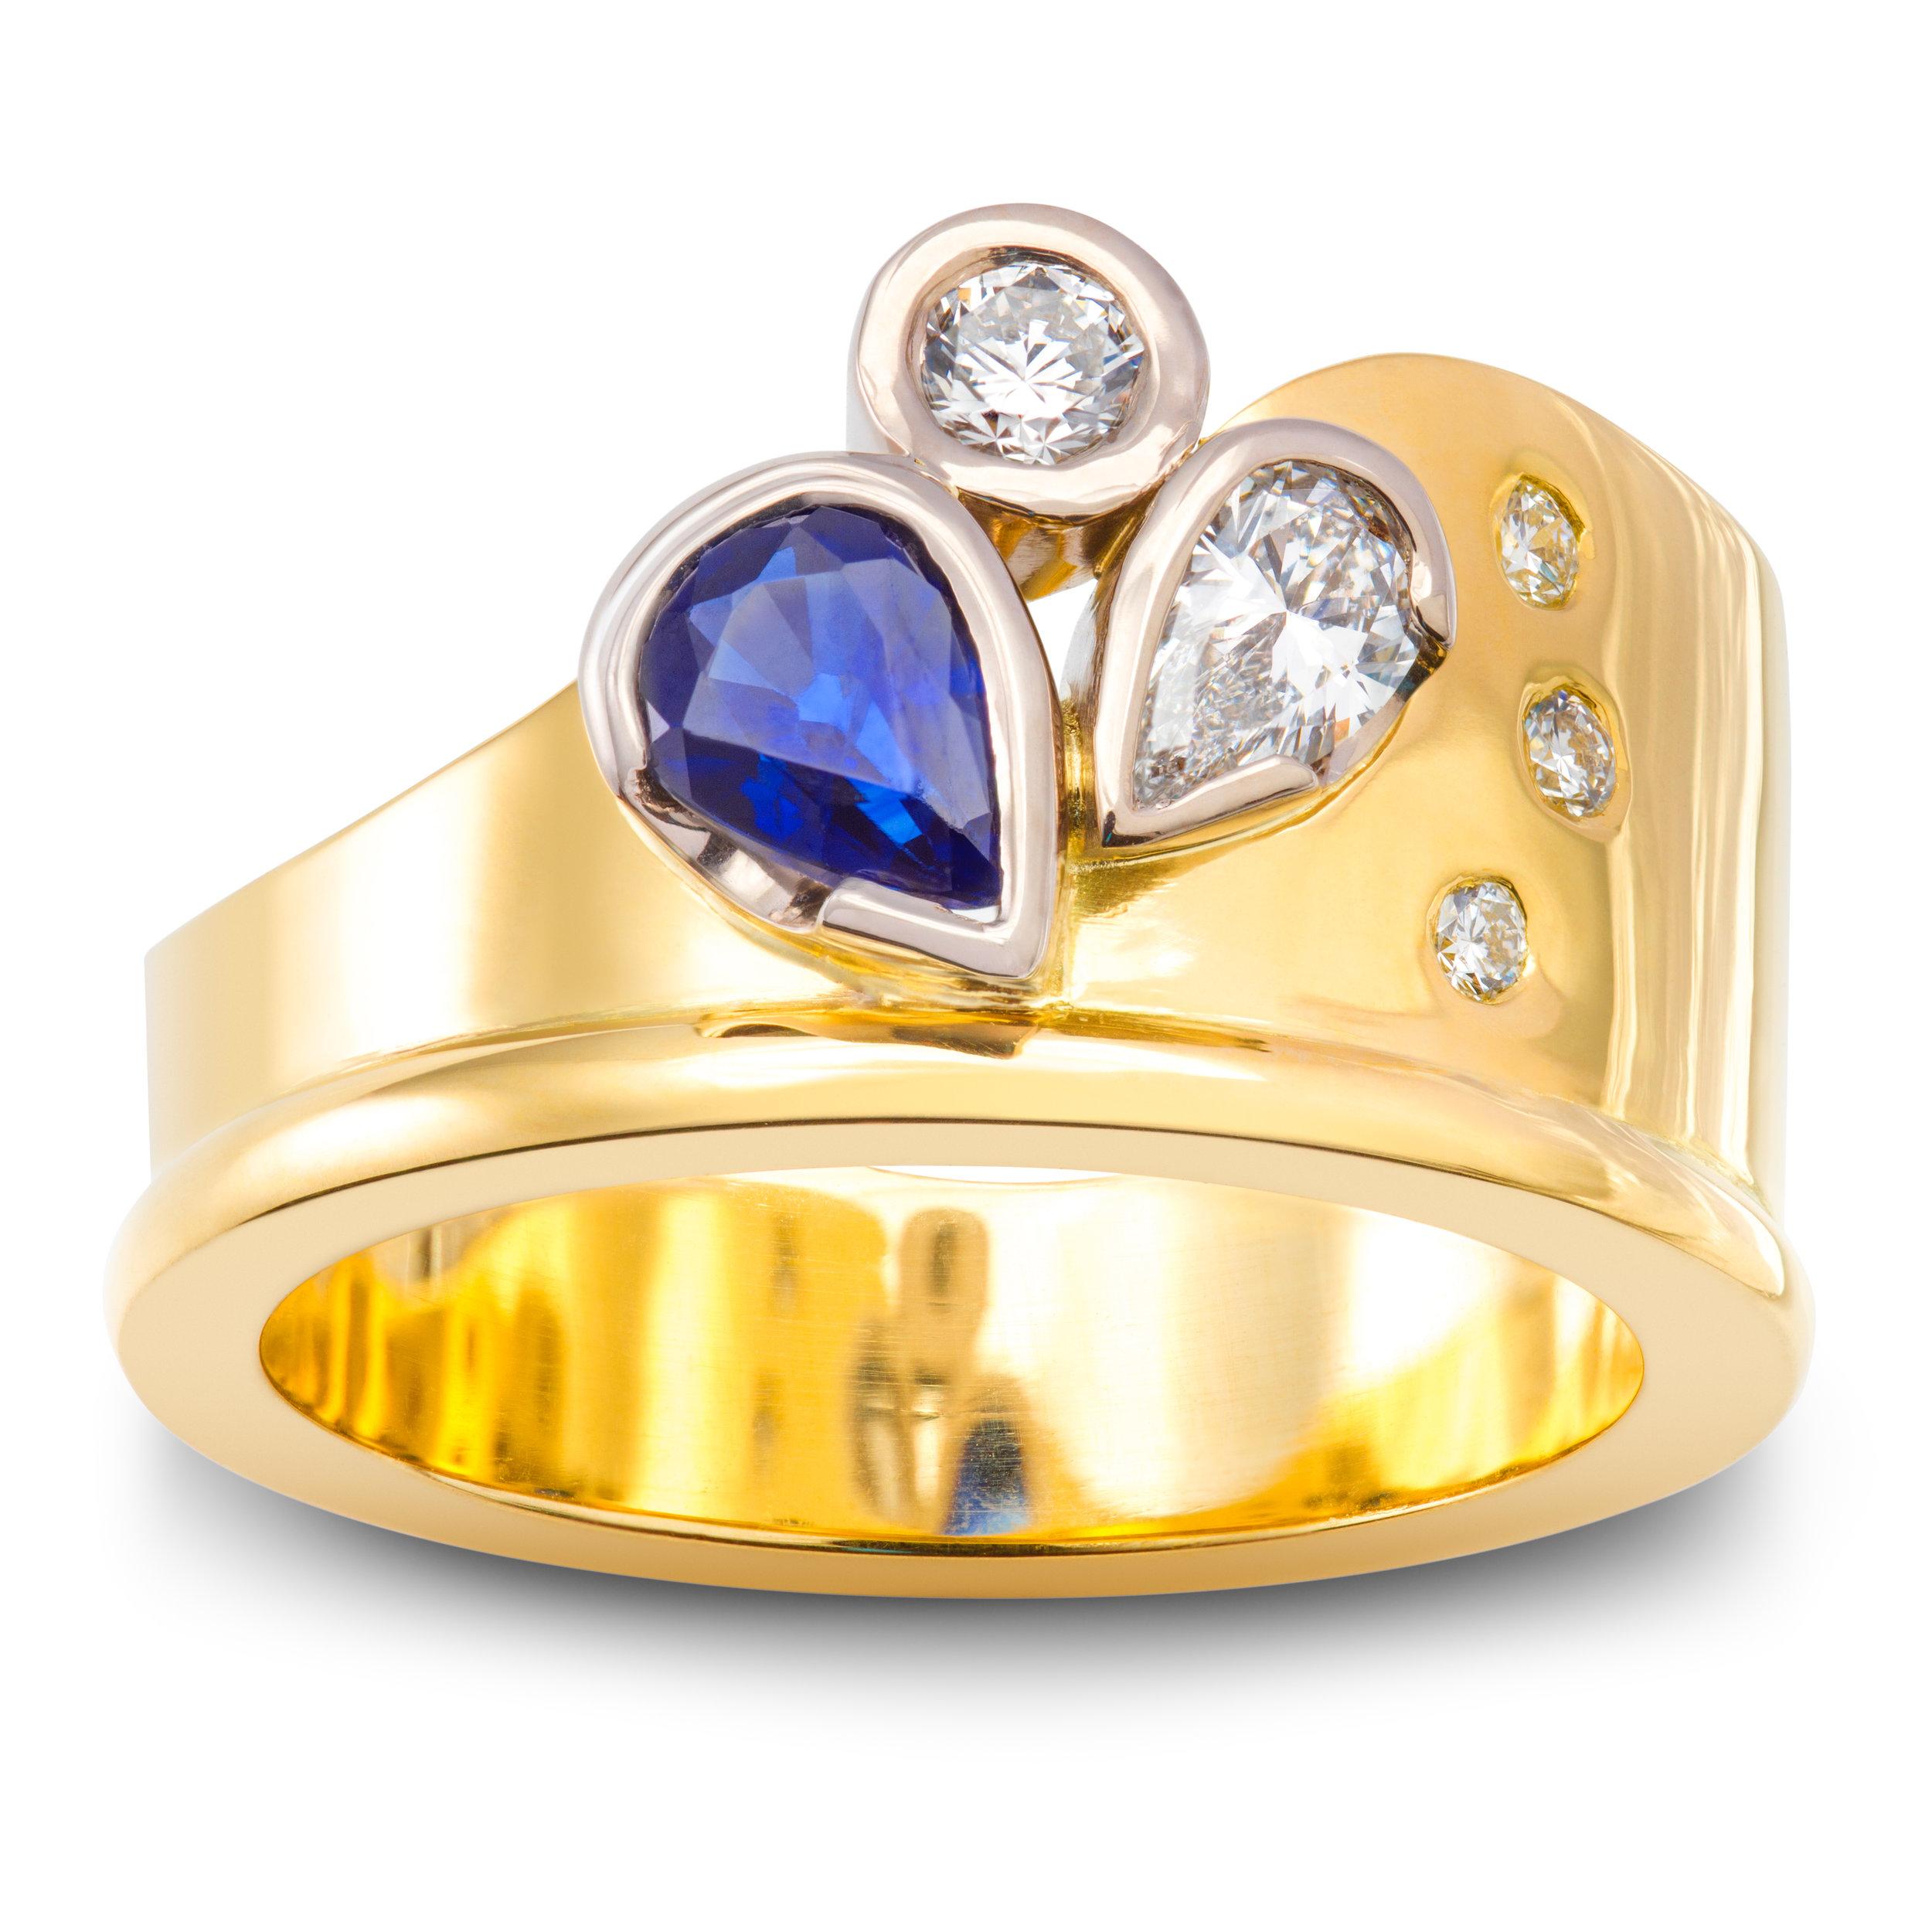 Bespoke 18ct yellow gold sapphire and diamond dress ring commission